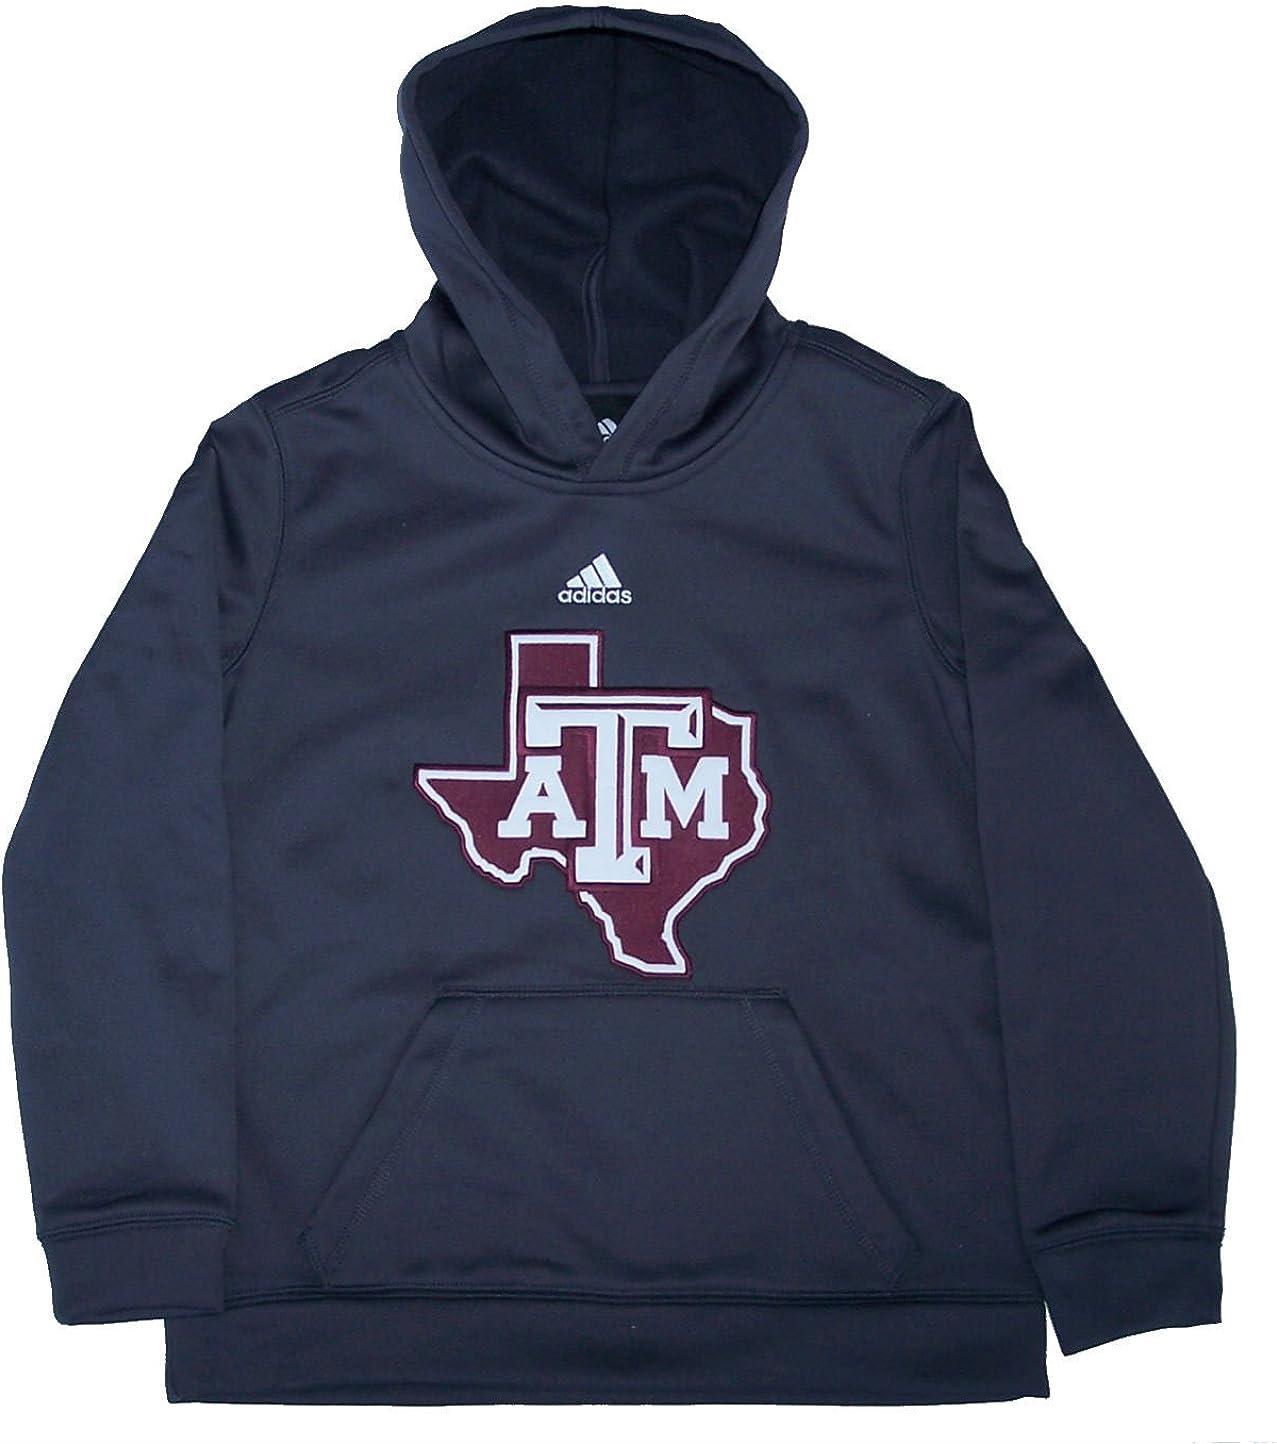 adidas hoodie xl size